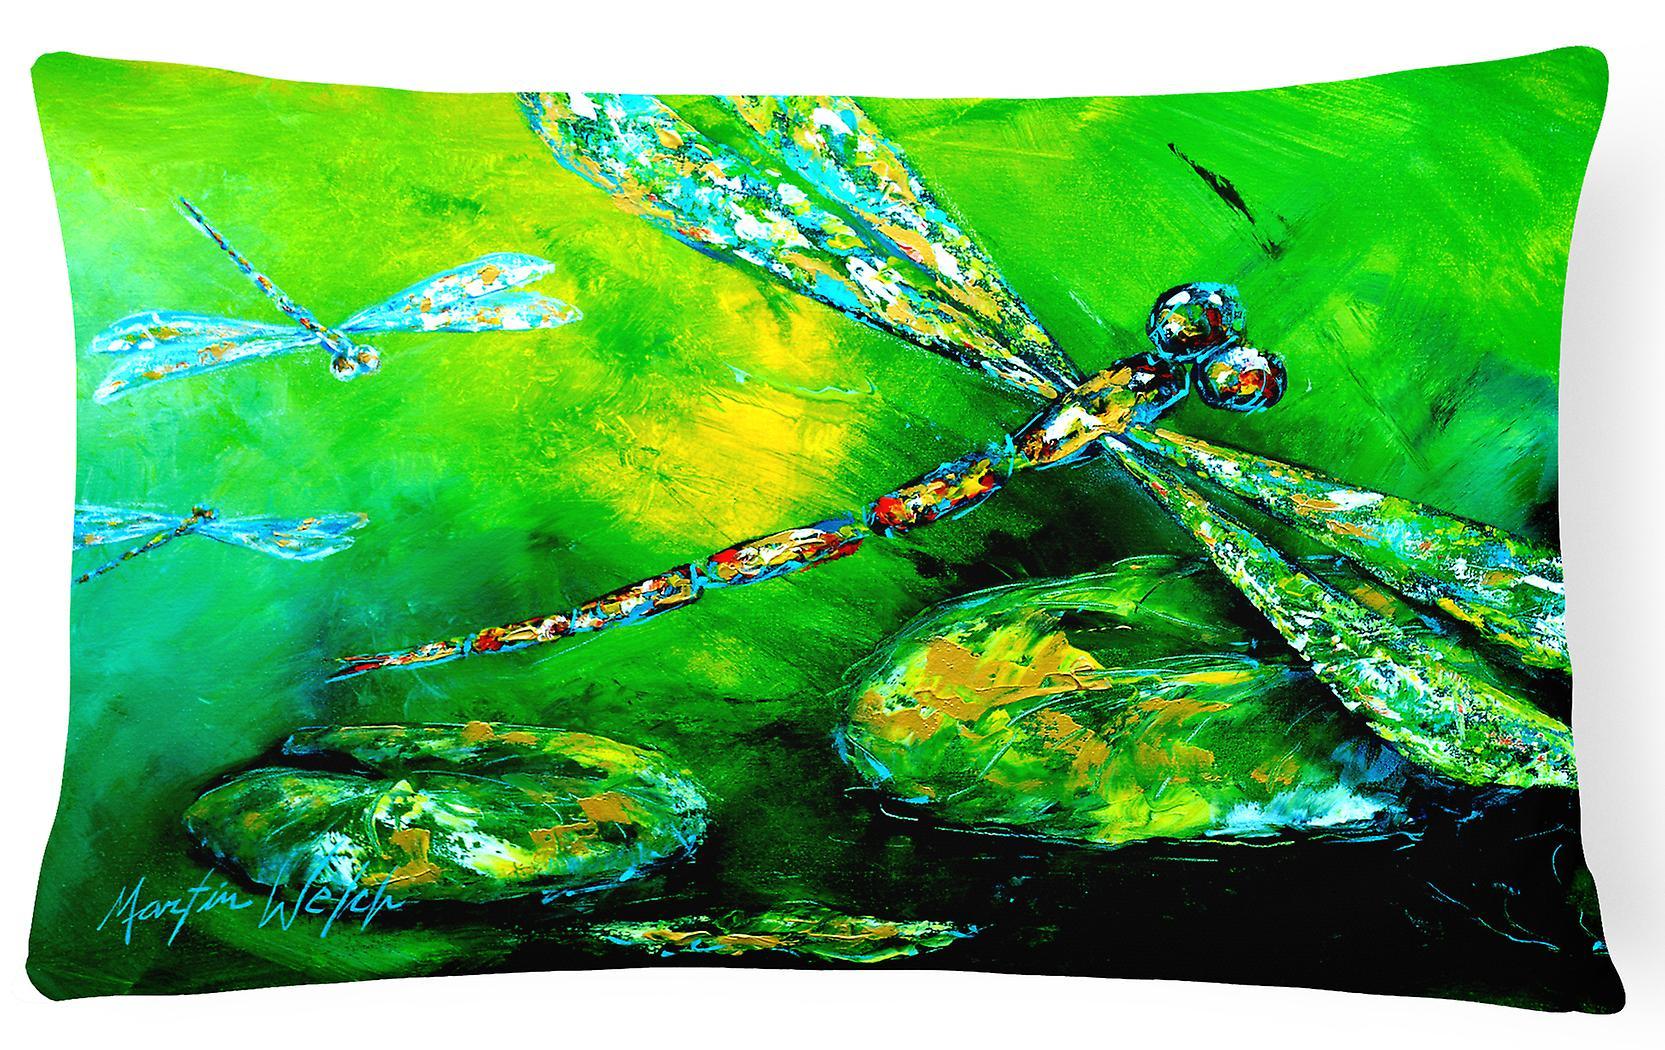 Trésors Mouches Toile Libellule Mw1114pw1216 Summer Carolines Tissu Decorat HDEe2IW9Yb